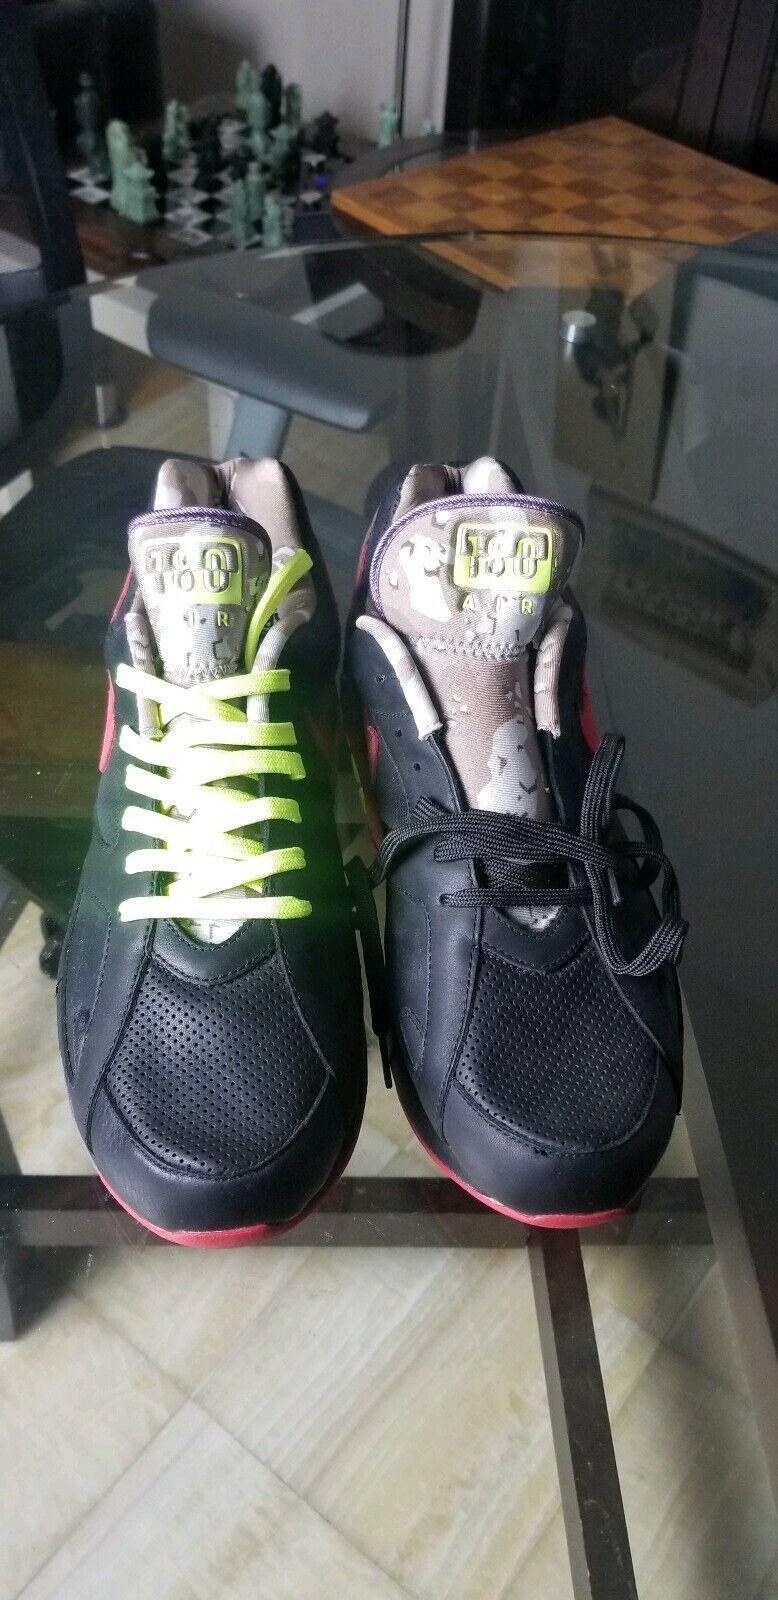 08953db19d7 Nike Air Max 180 Premium Sz. 13 Opium Priority nxtjxy1830-Athletic Shoes